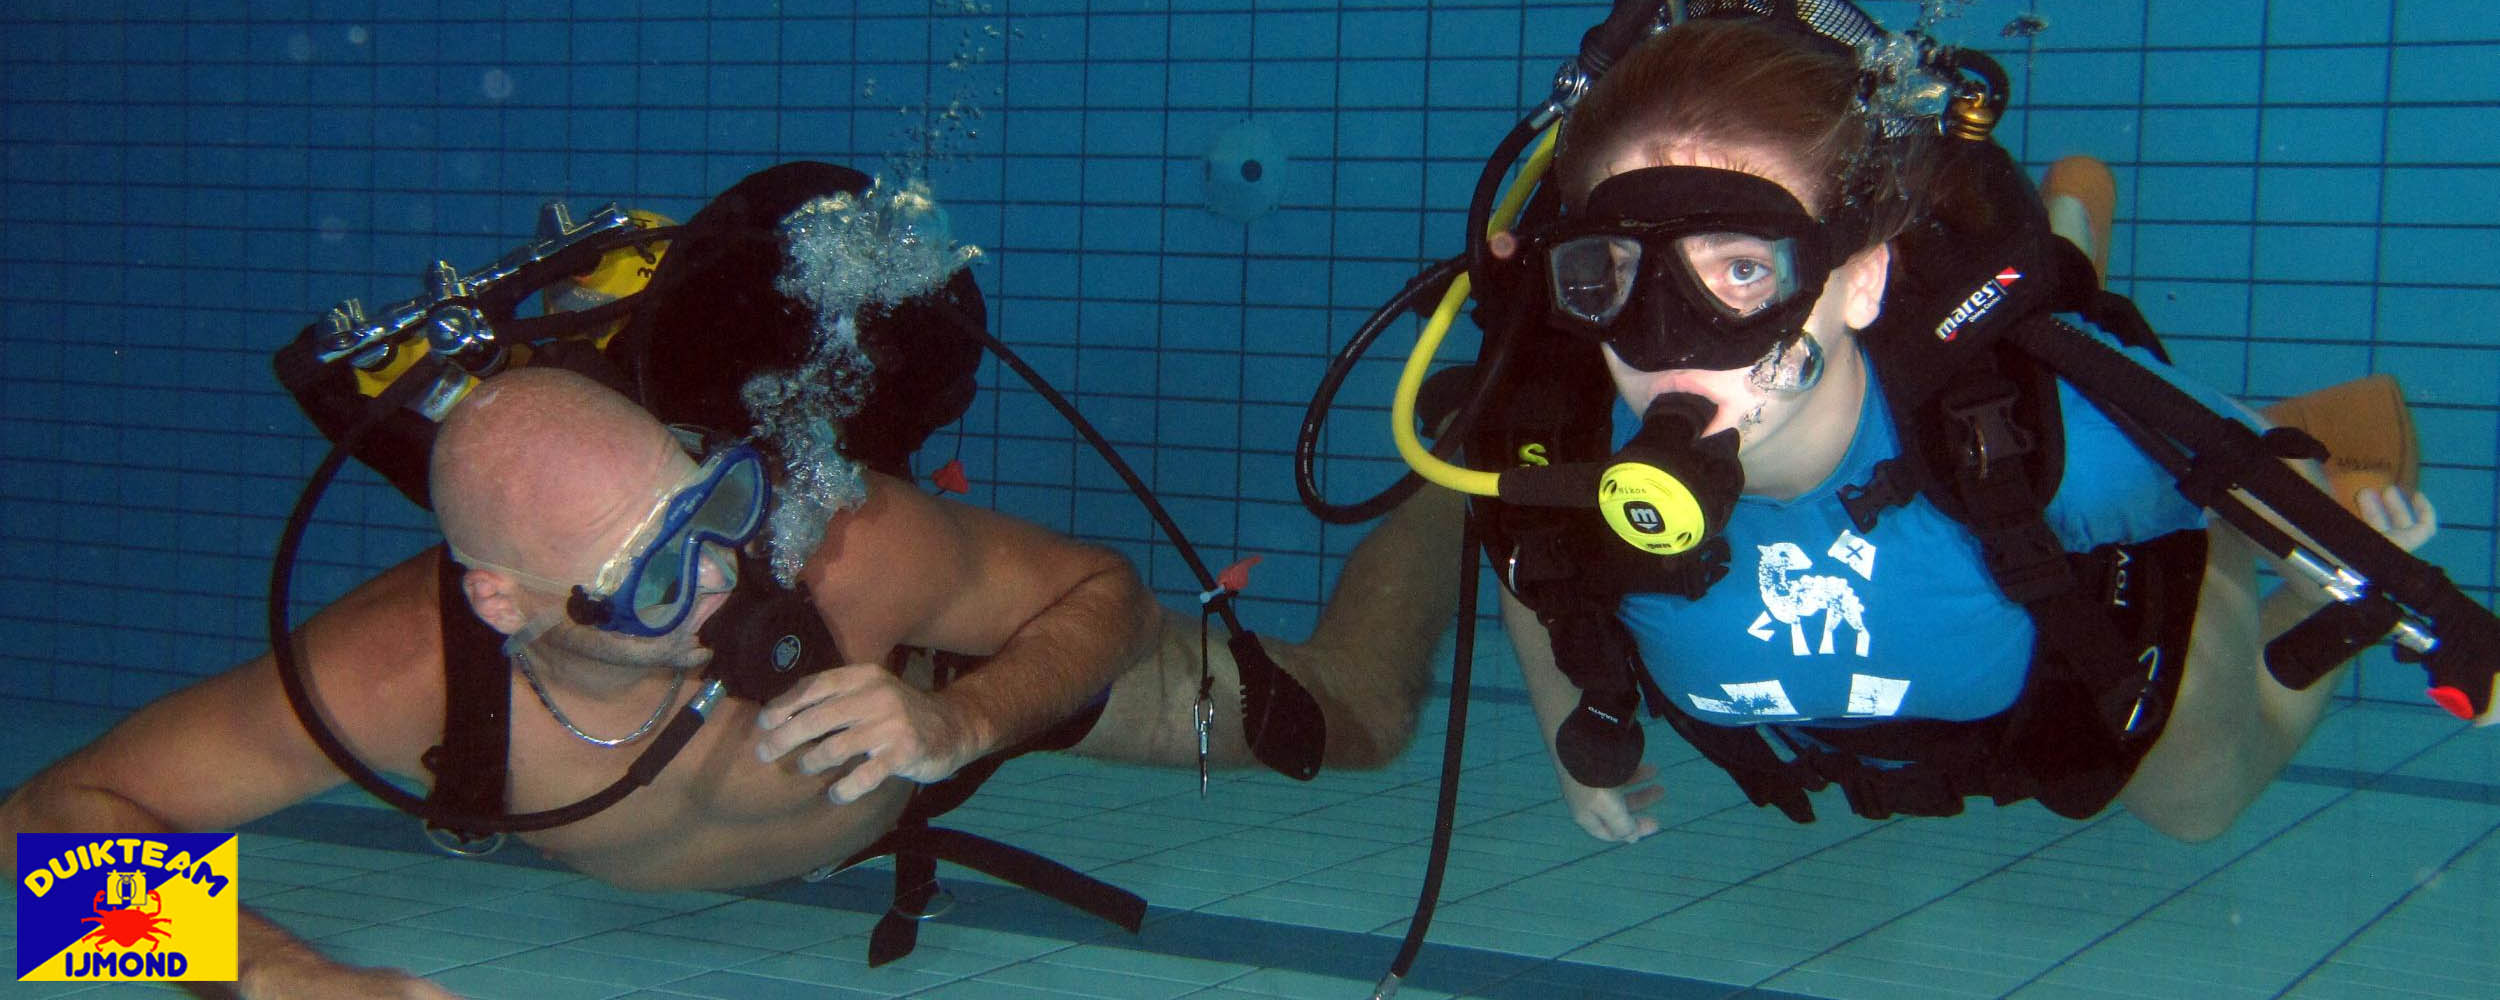 duikopleiding bij duikteam ijmond